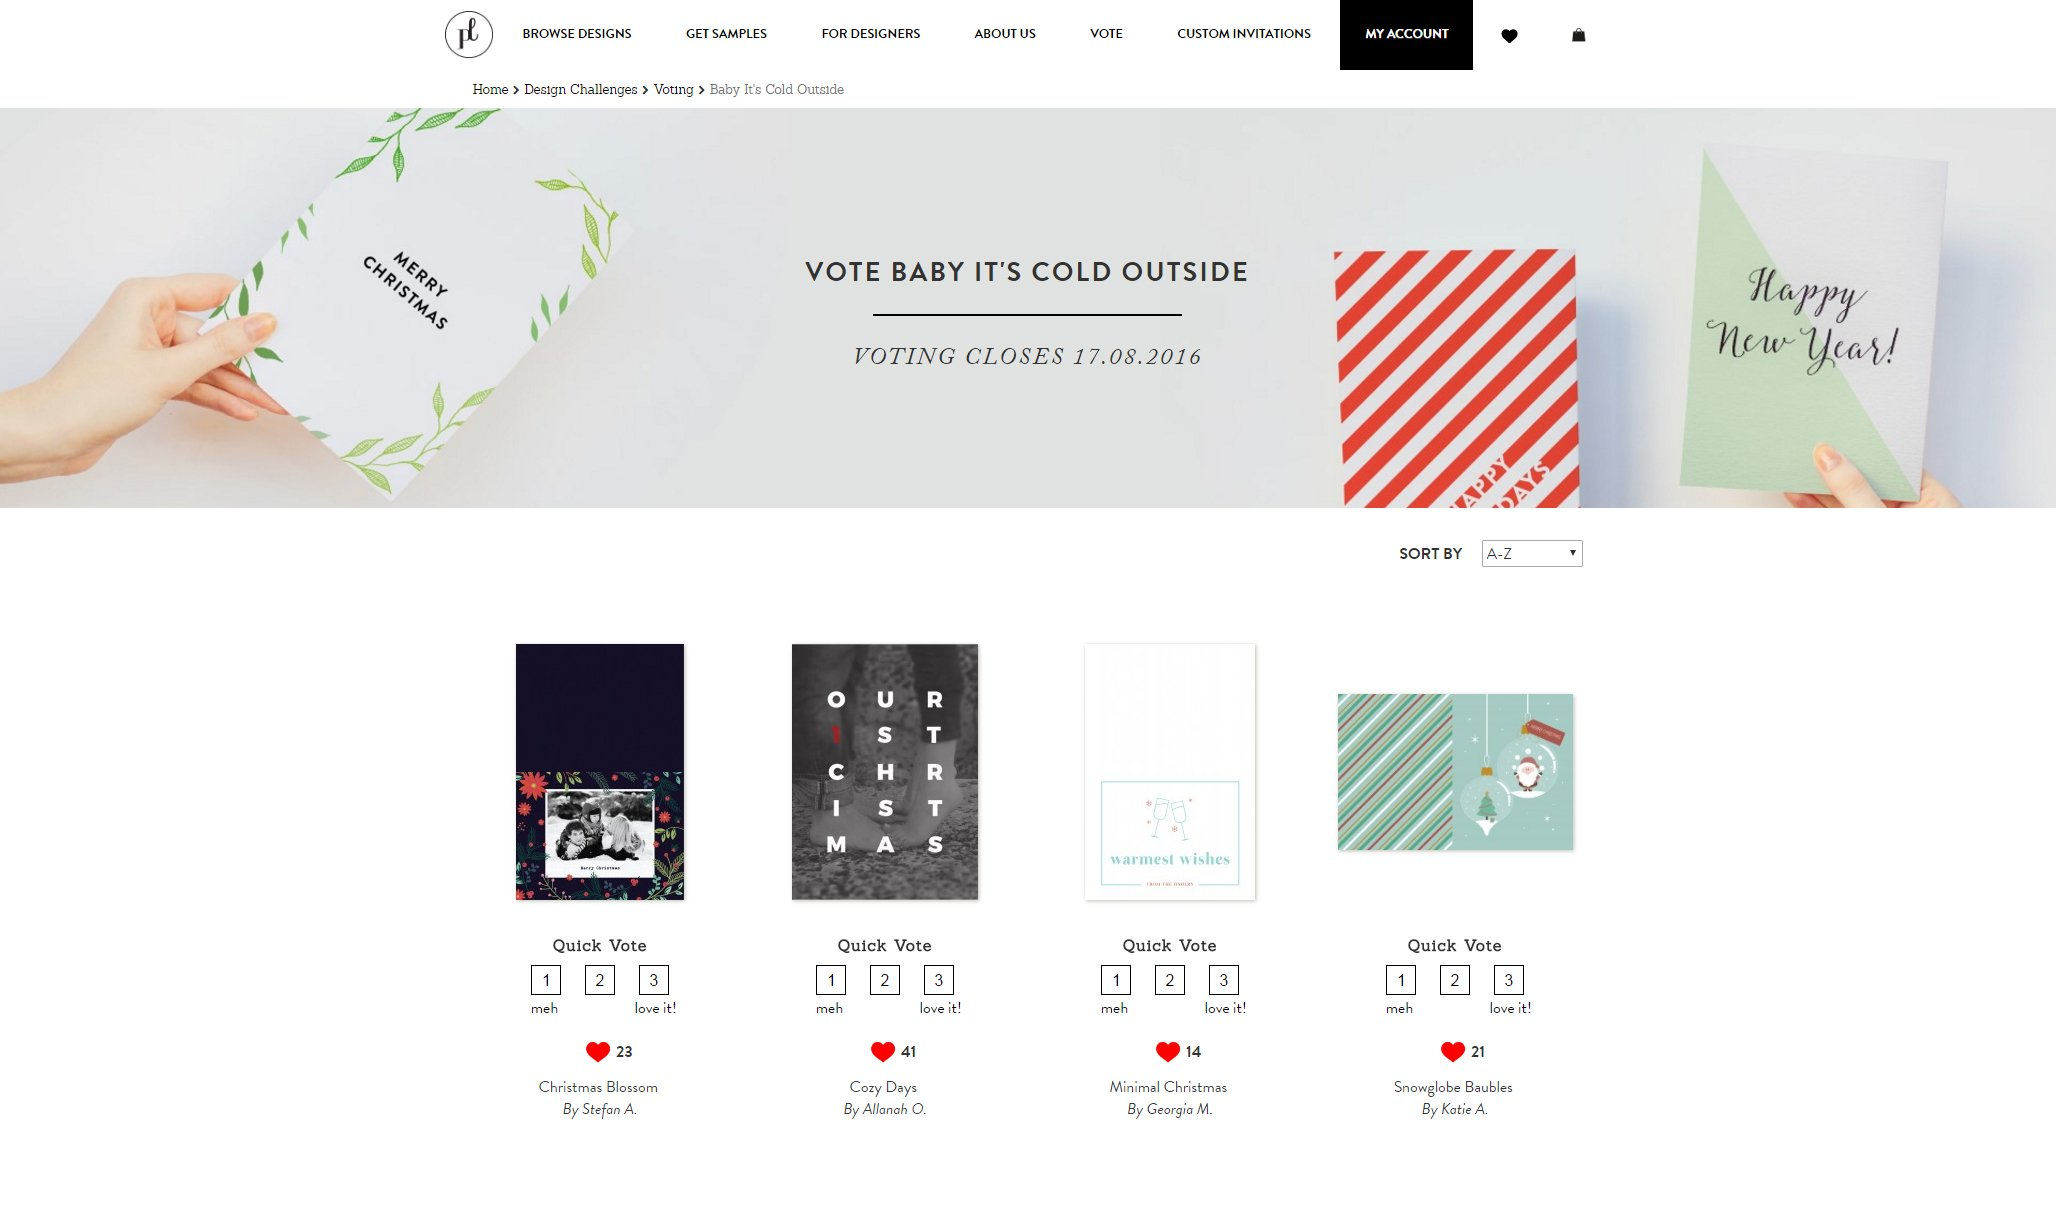 paperlust design challenge voting